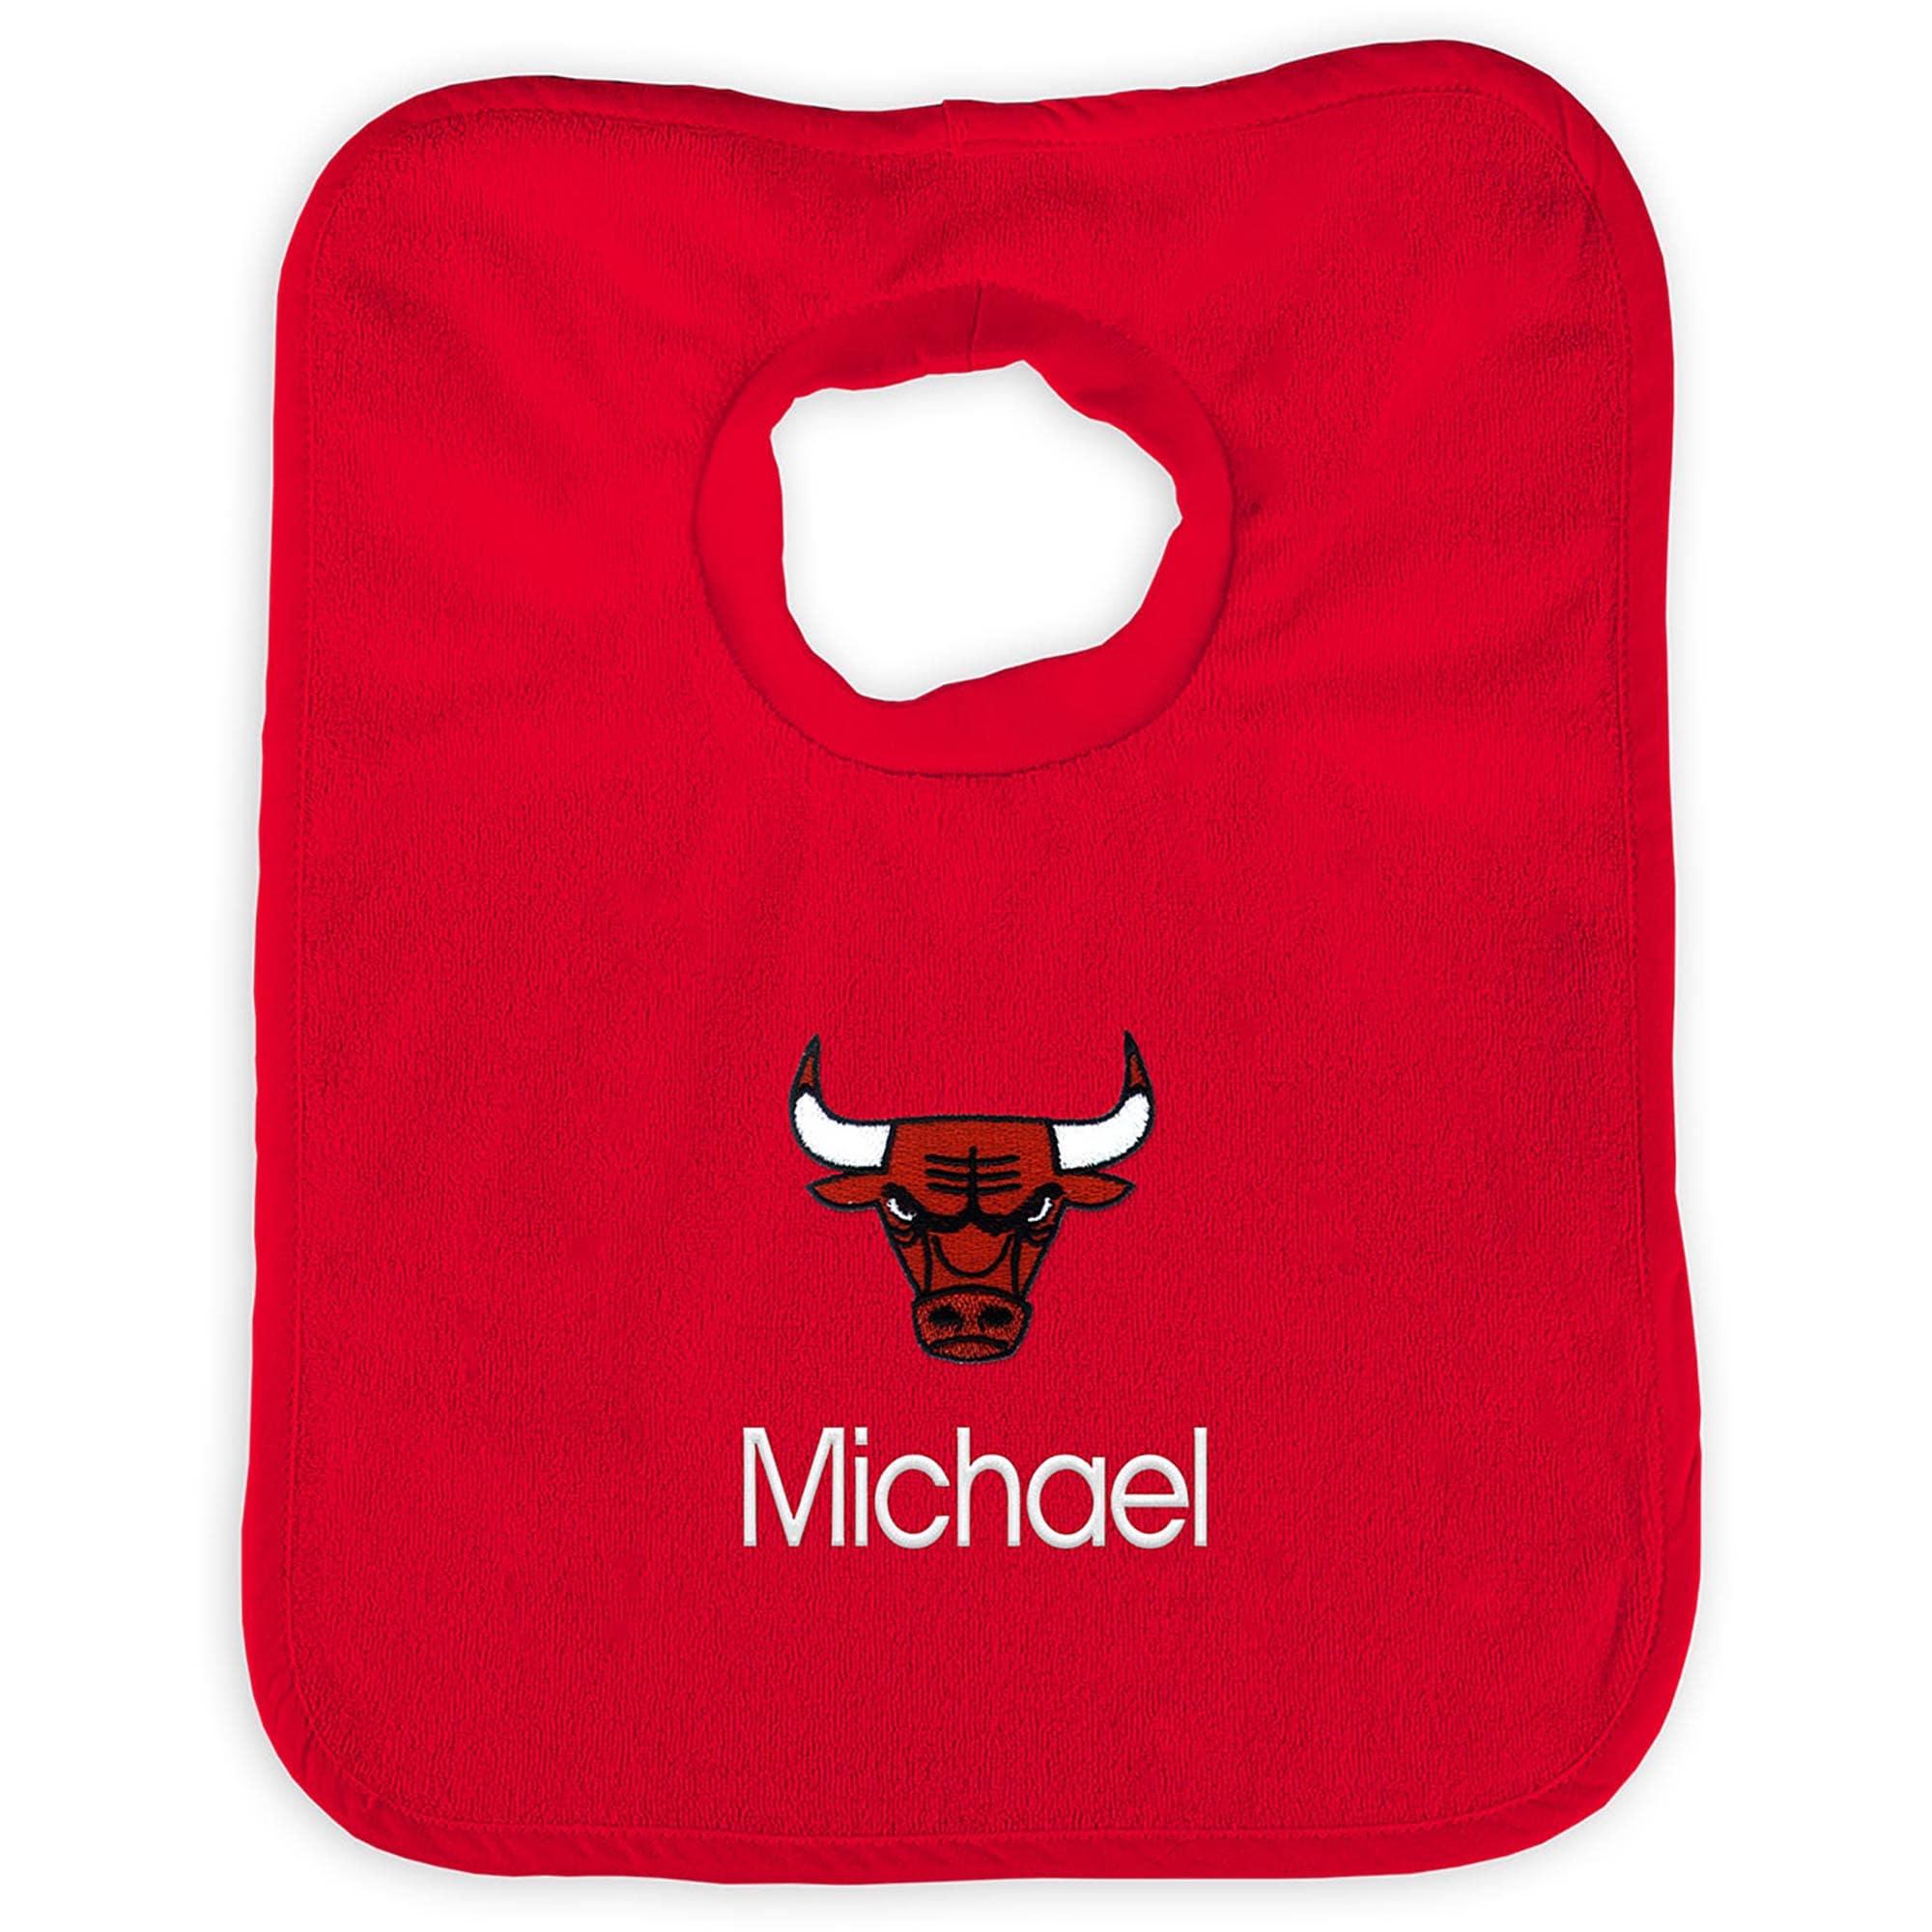 Chicago Bulls Infant Personalized Bib - Black